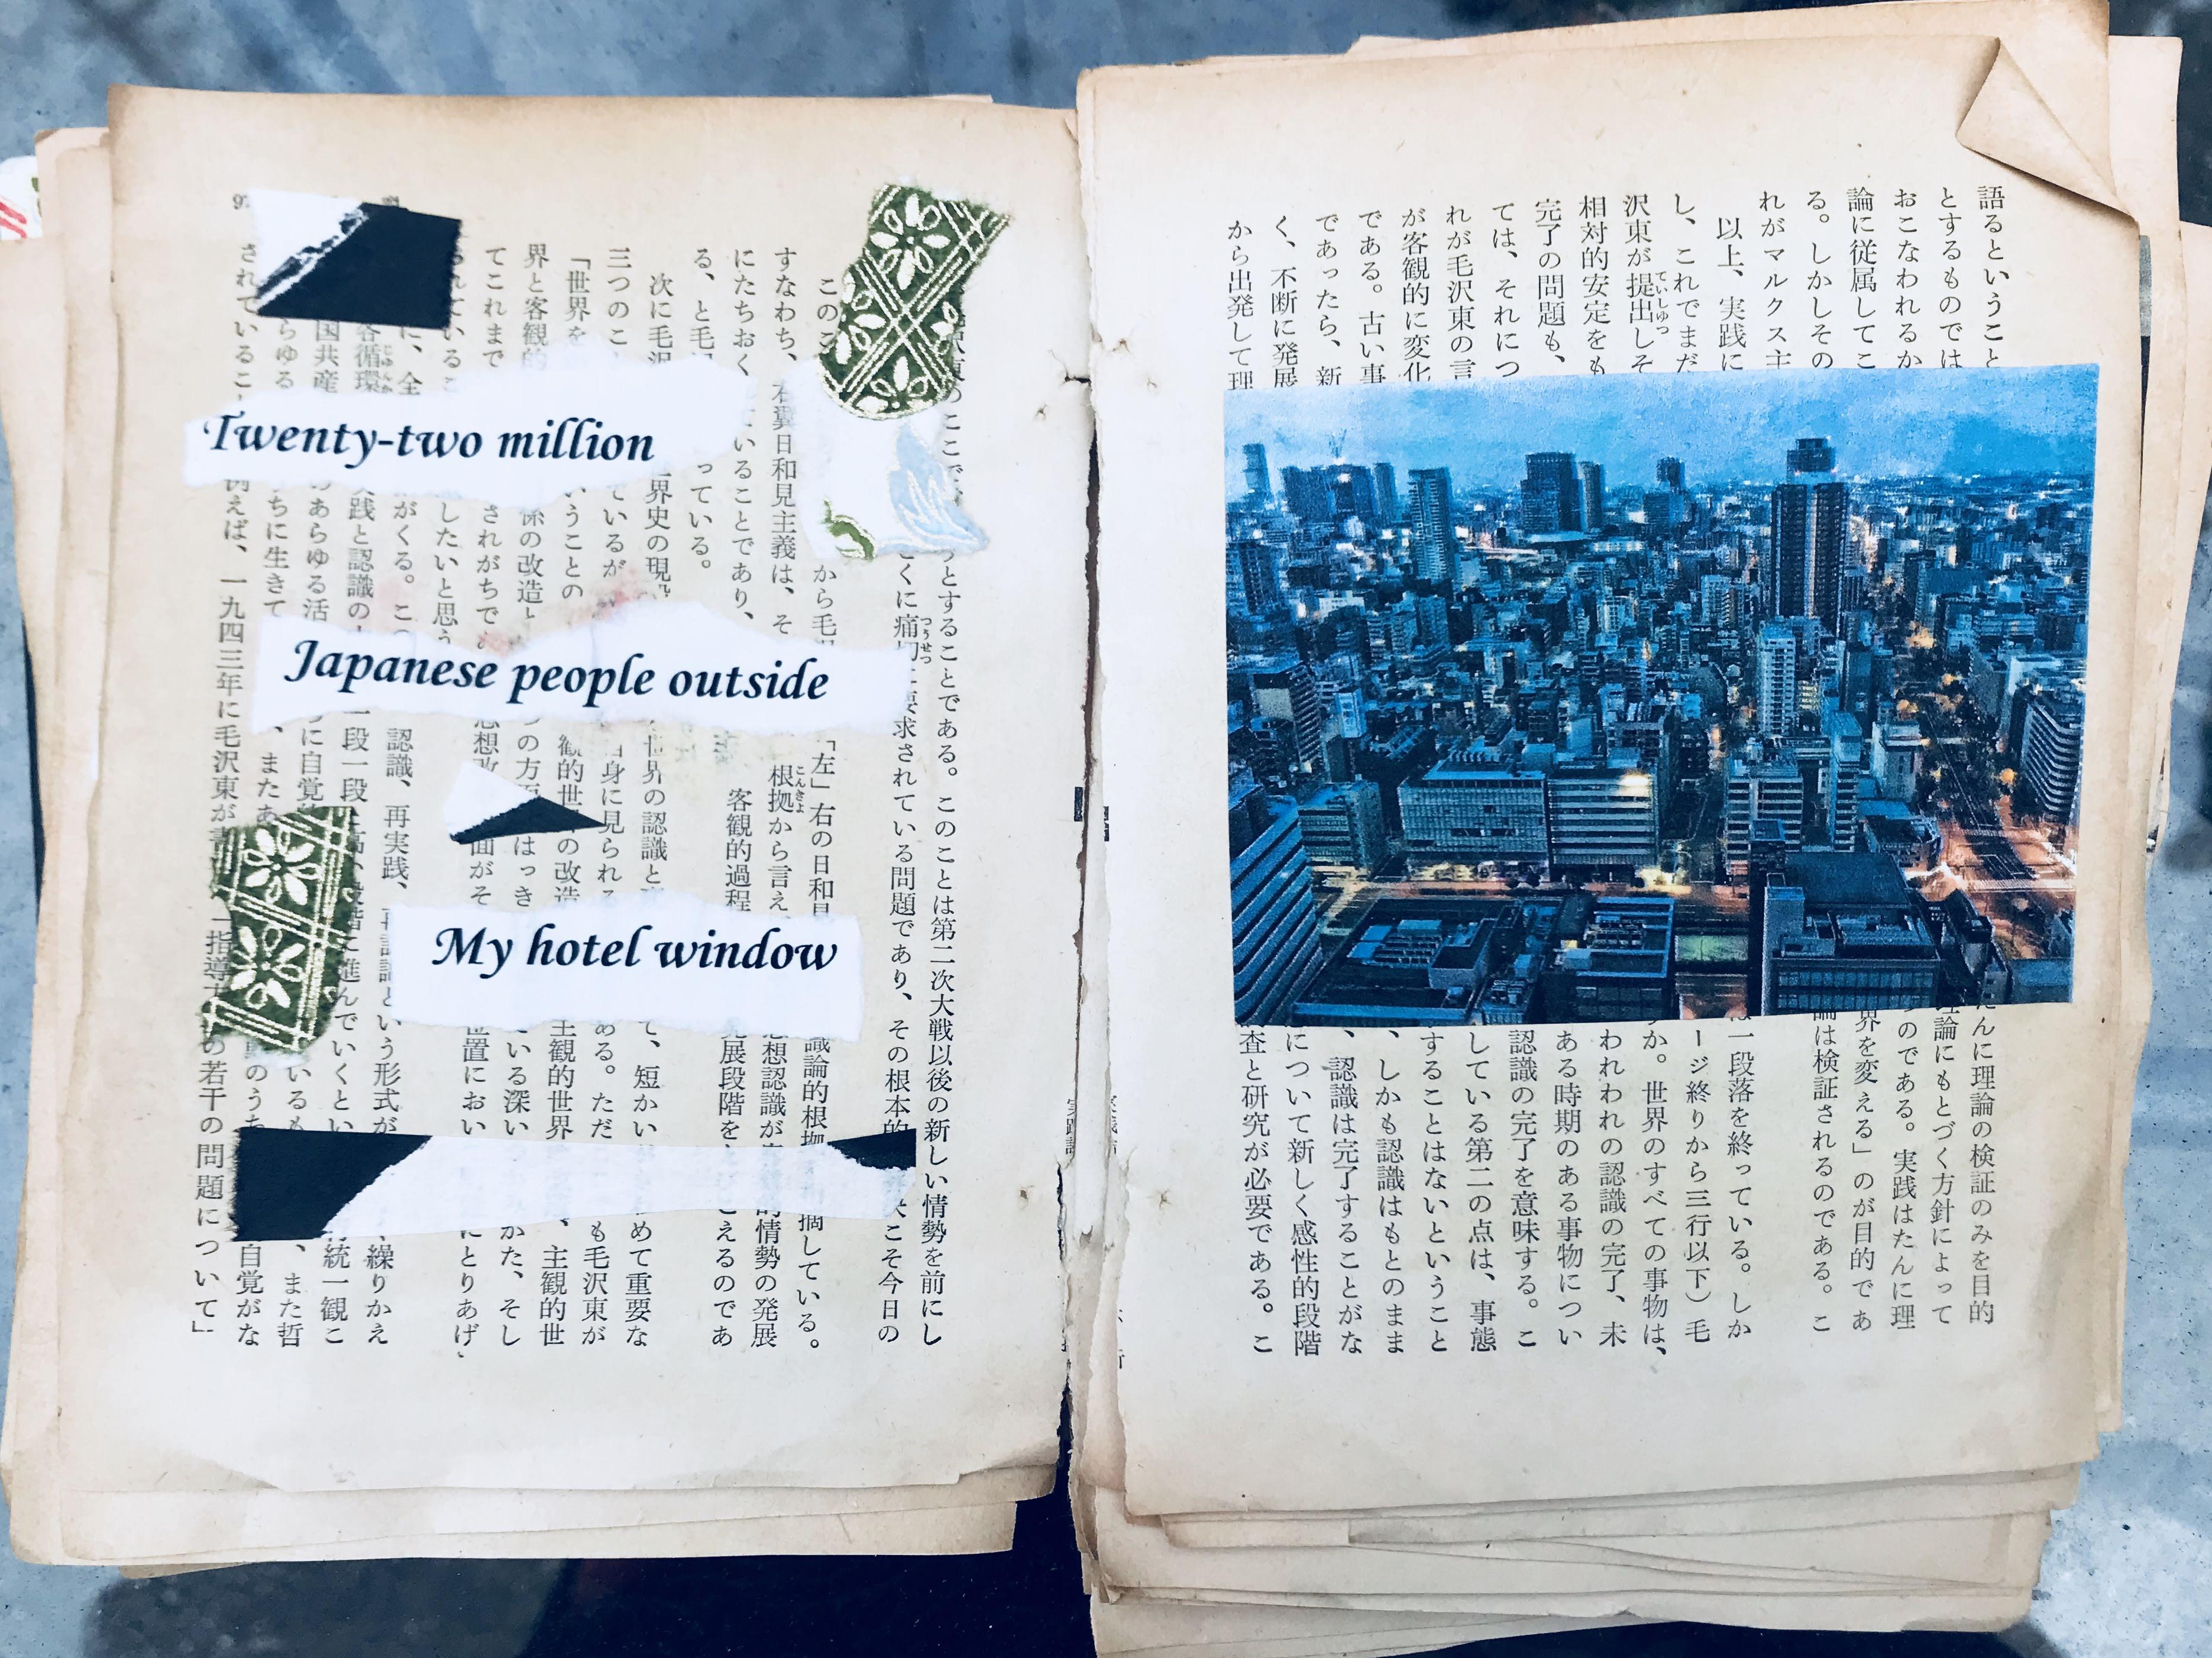 Haiku from Bodhisatva Vow, Photographs, Haiku and Tanka of Japan by Sydney Solis